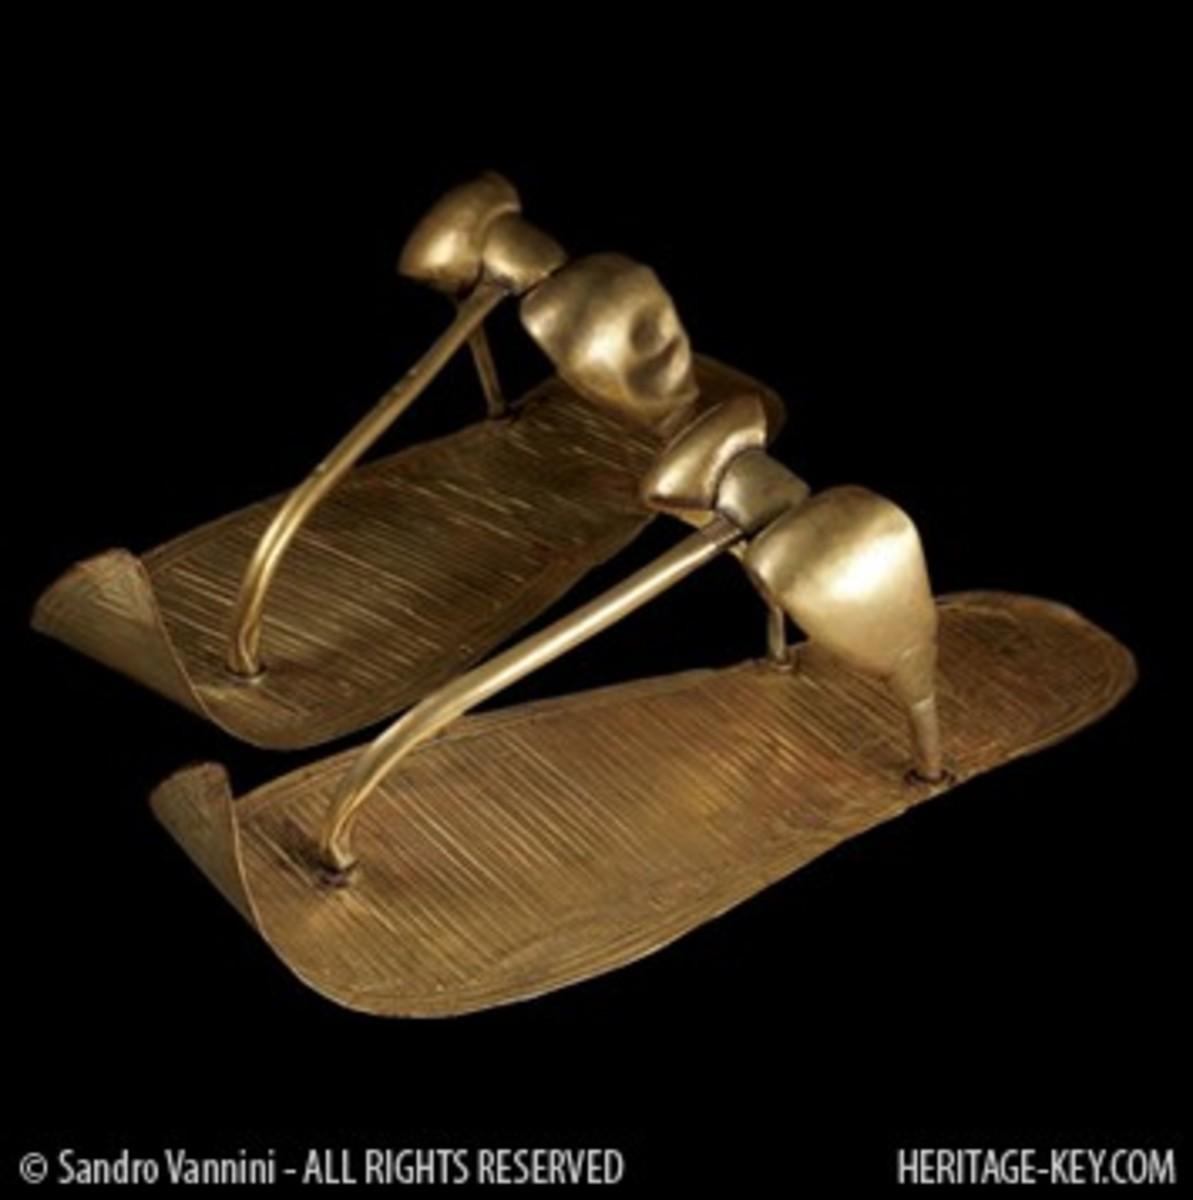 King Tut's Golden Sandals